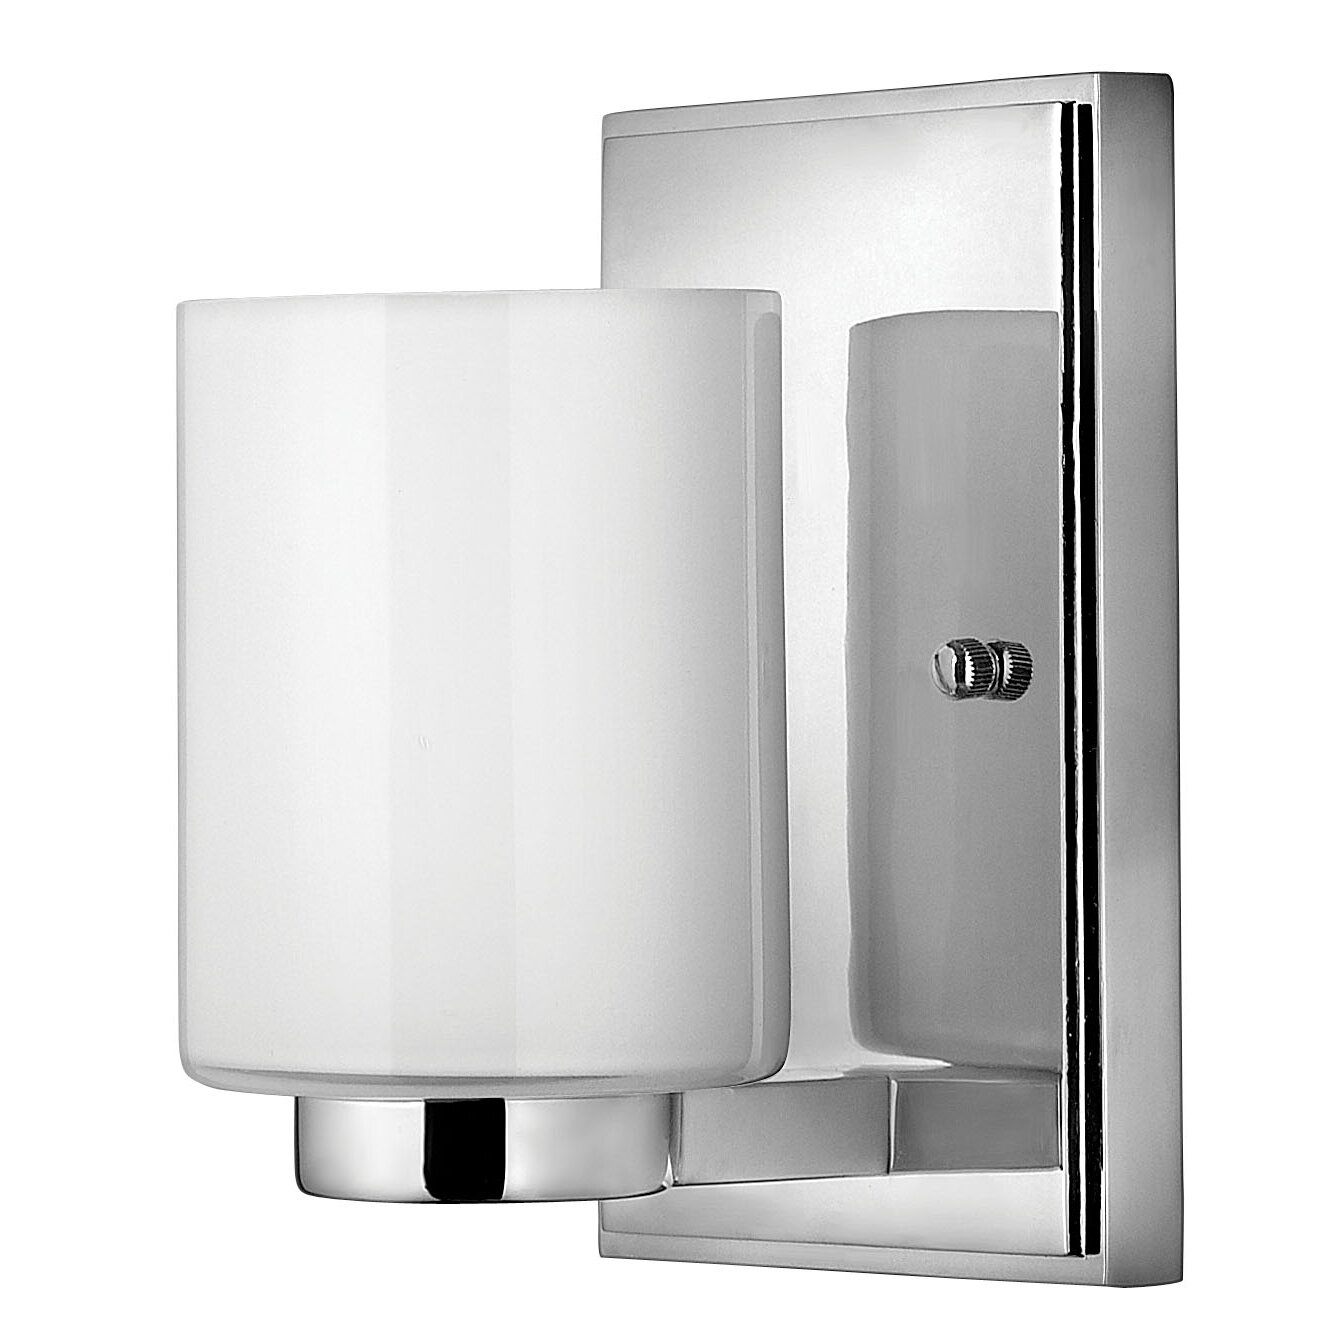 Hinkley lighting miley 1 light wall sconce reviews wayfair for Hinkley bathroom sconces